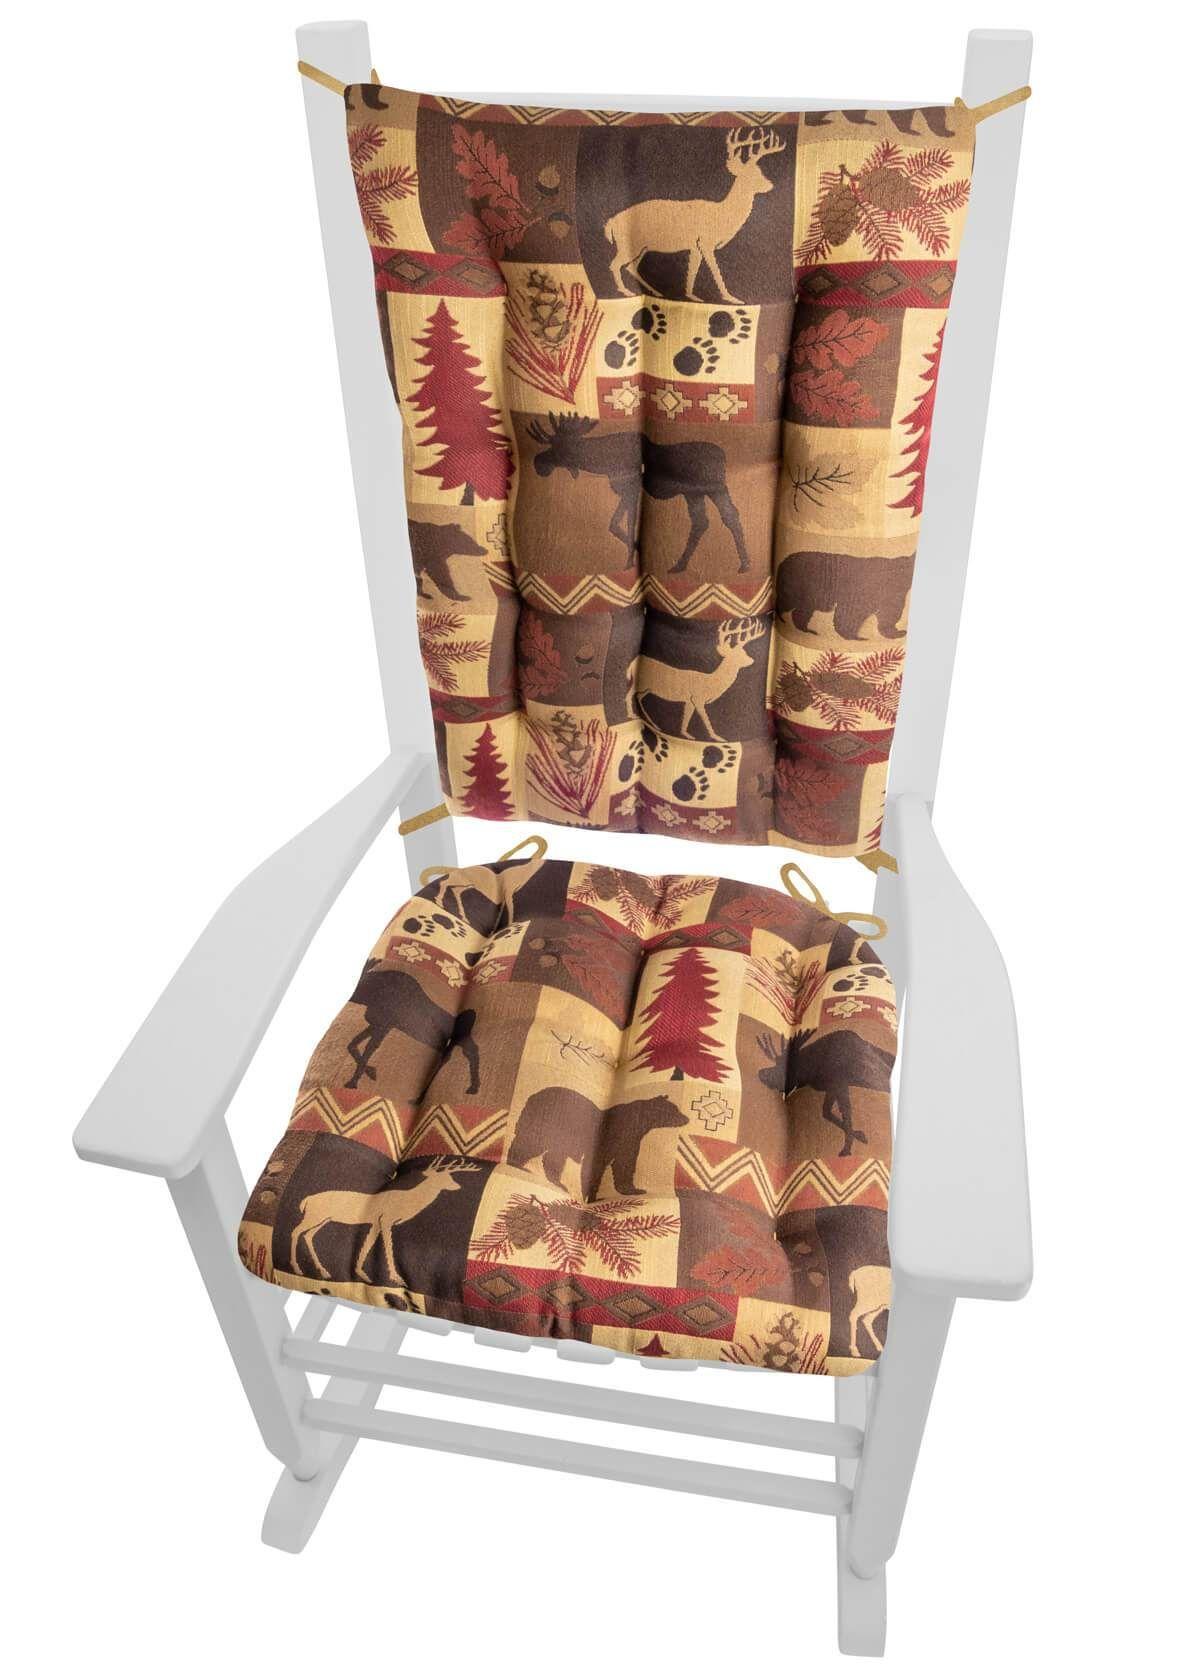 Wilderness summit garnet rocking chair cushions latex foam fill